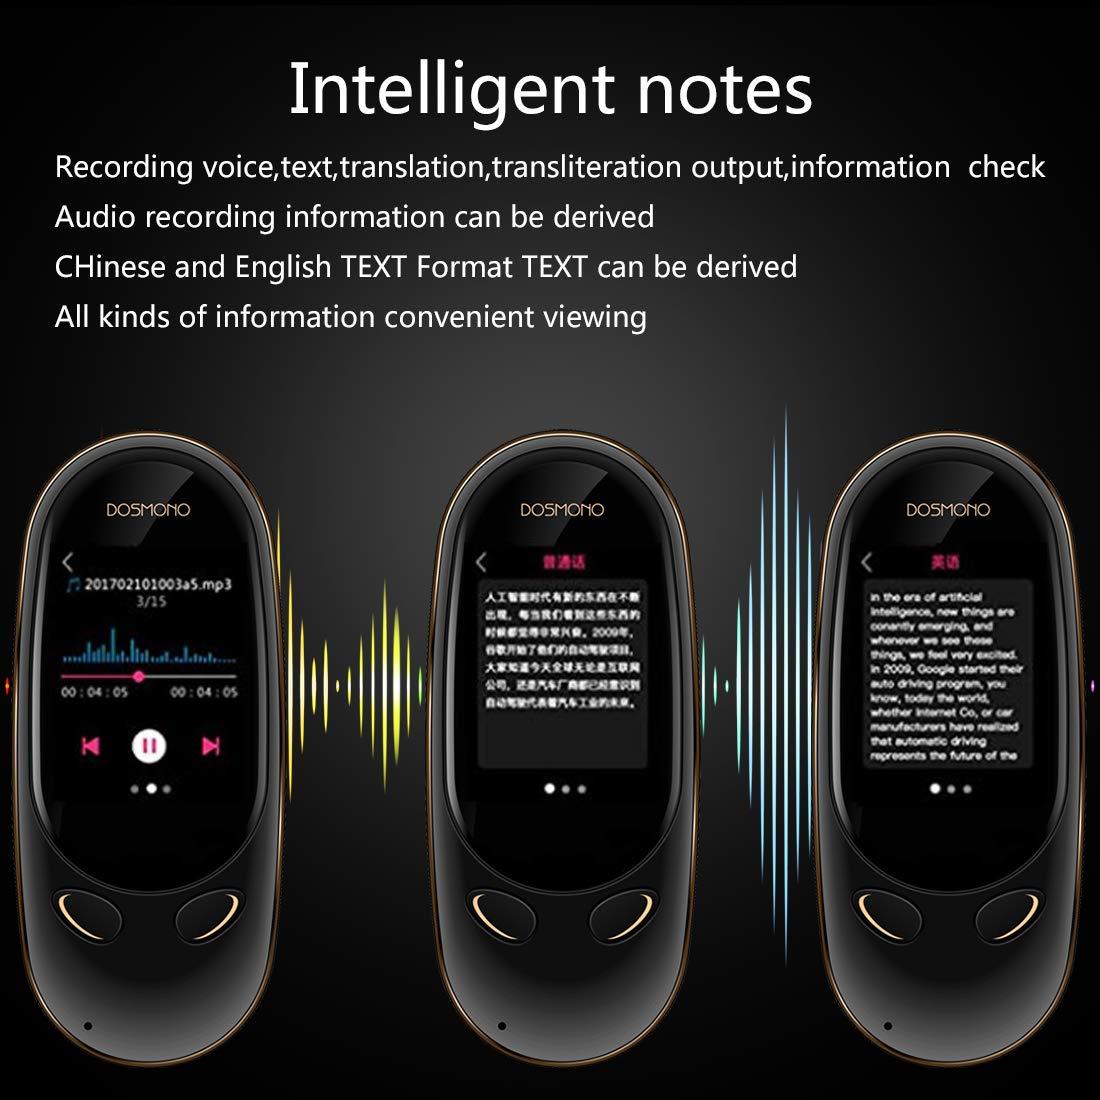 Smart Language Translator Device,72 Languages Online 8 Languages Offline AI Instant Digital Voices Translator Simultaneous Translation Recorder Intercom Device for Tourism Business Learning (Black) by Coholl (Image #8)